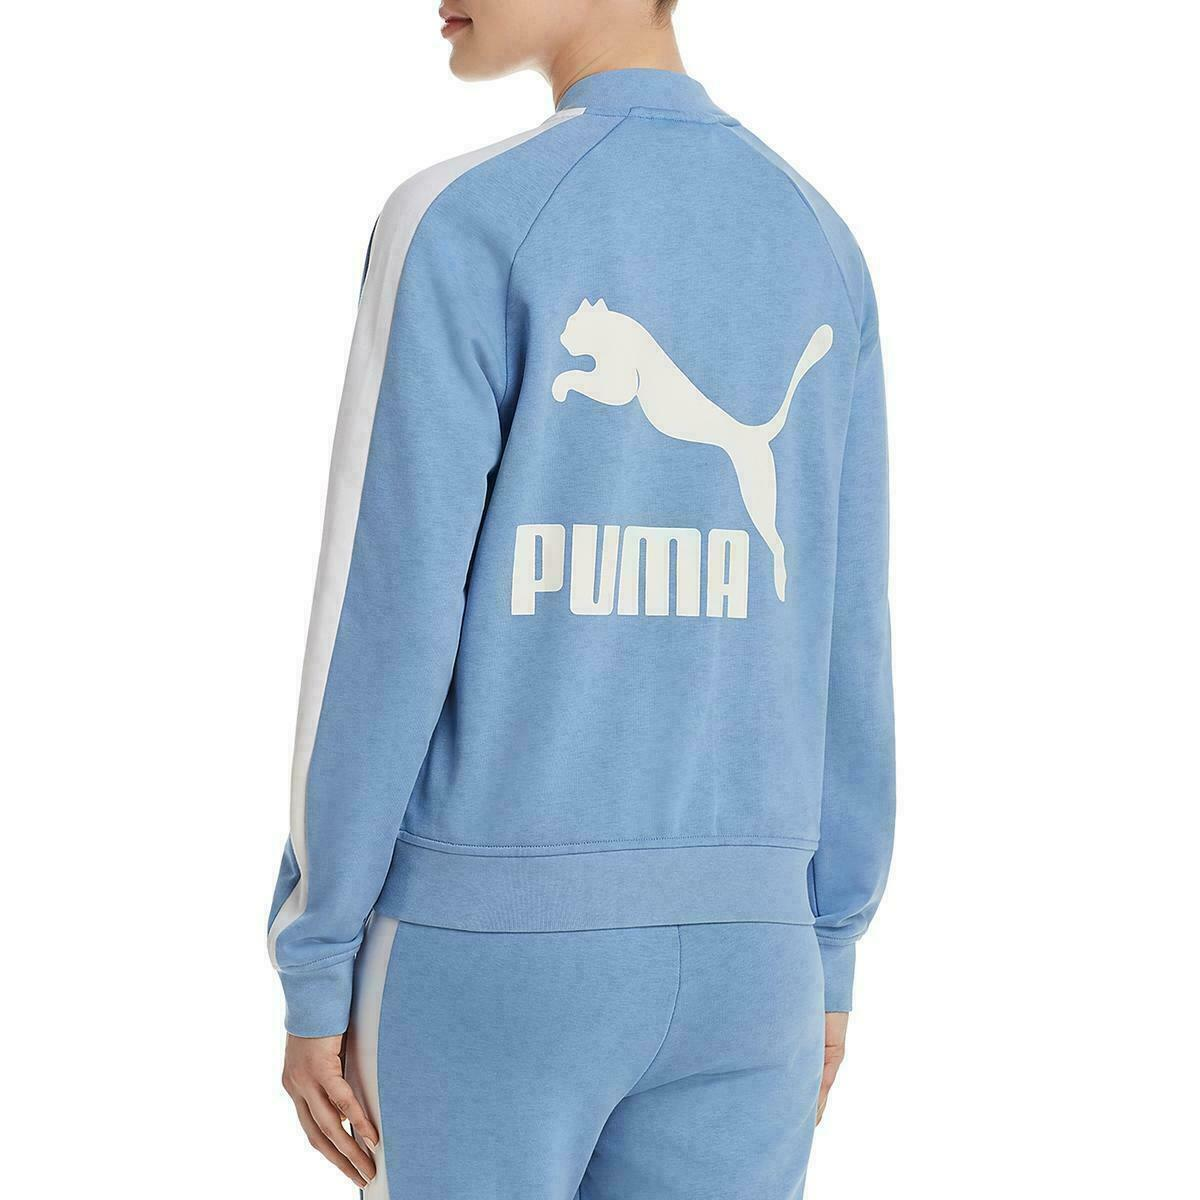 For Sport Womens Fitness Jacket Jogging Jacket Track Jacket Yoga 44//46 L NEW /& OVP